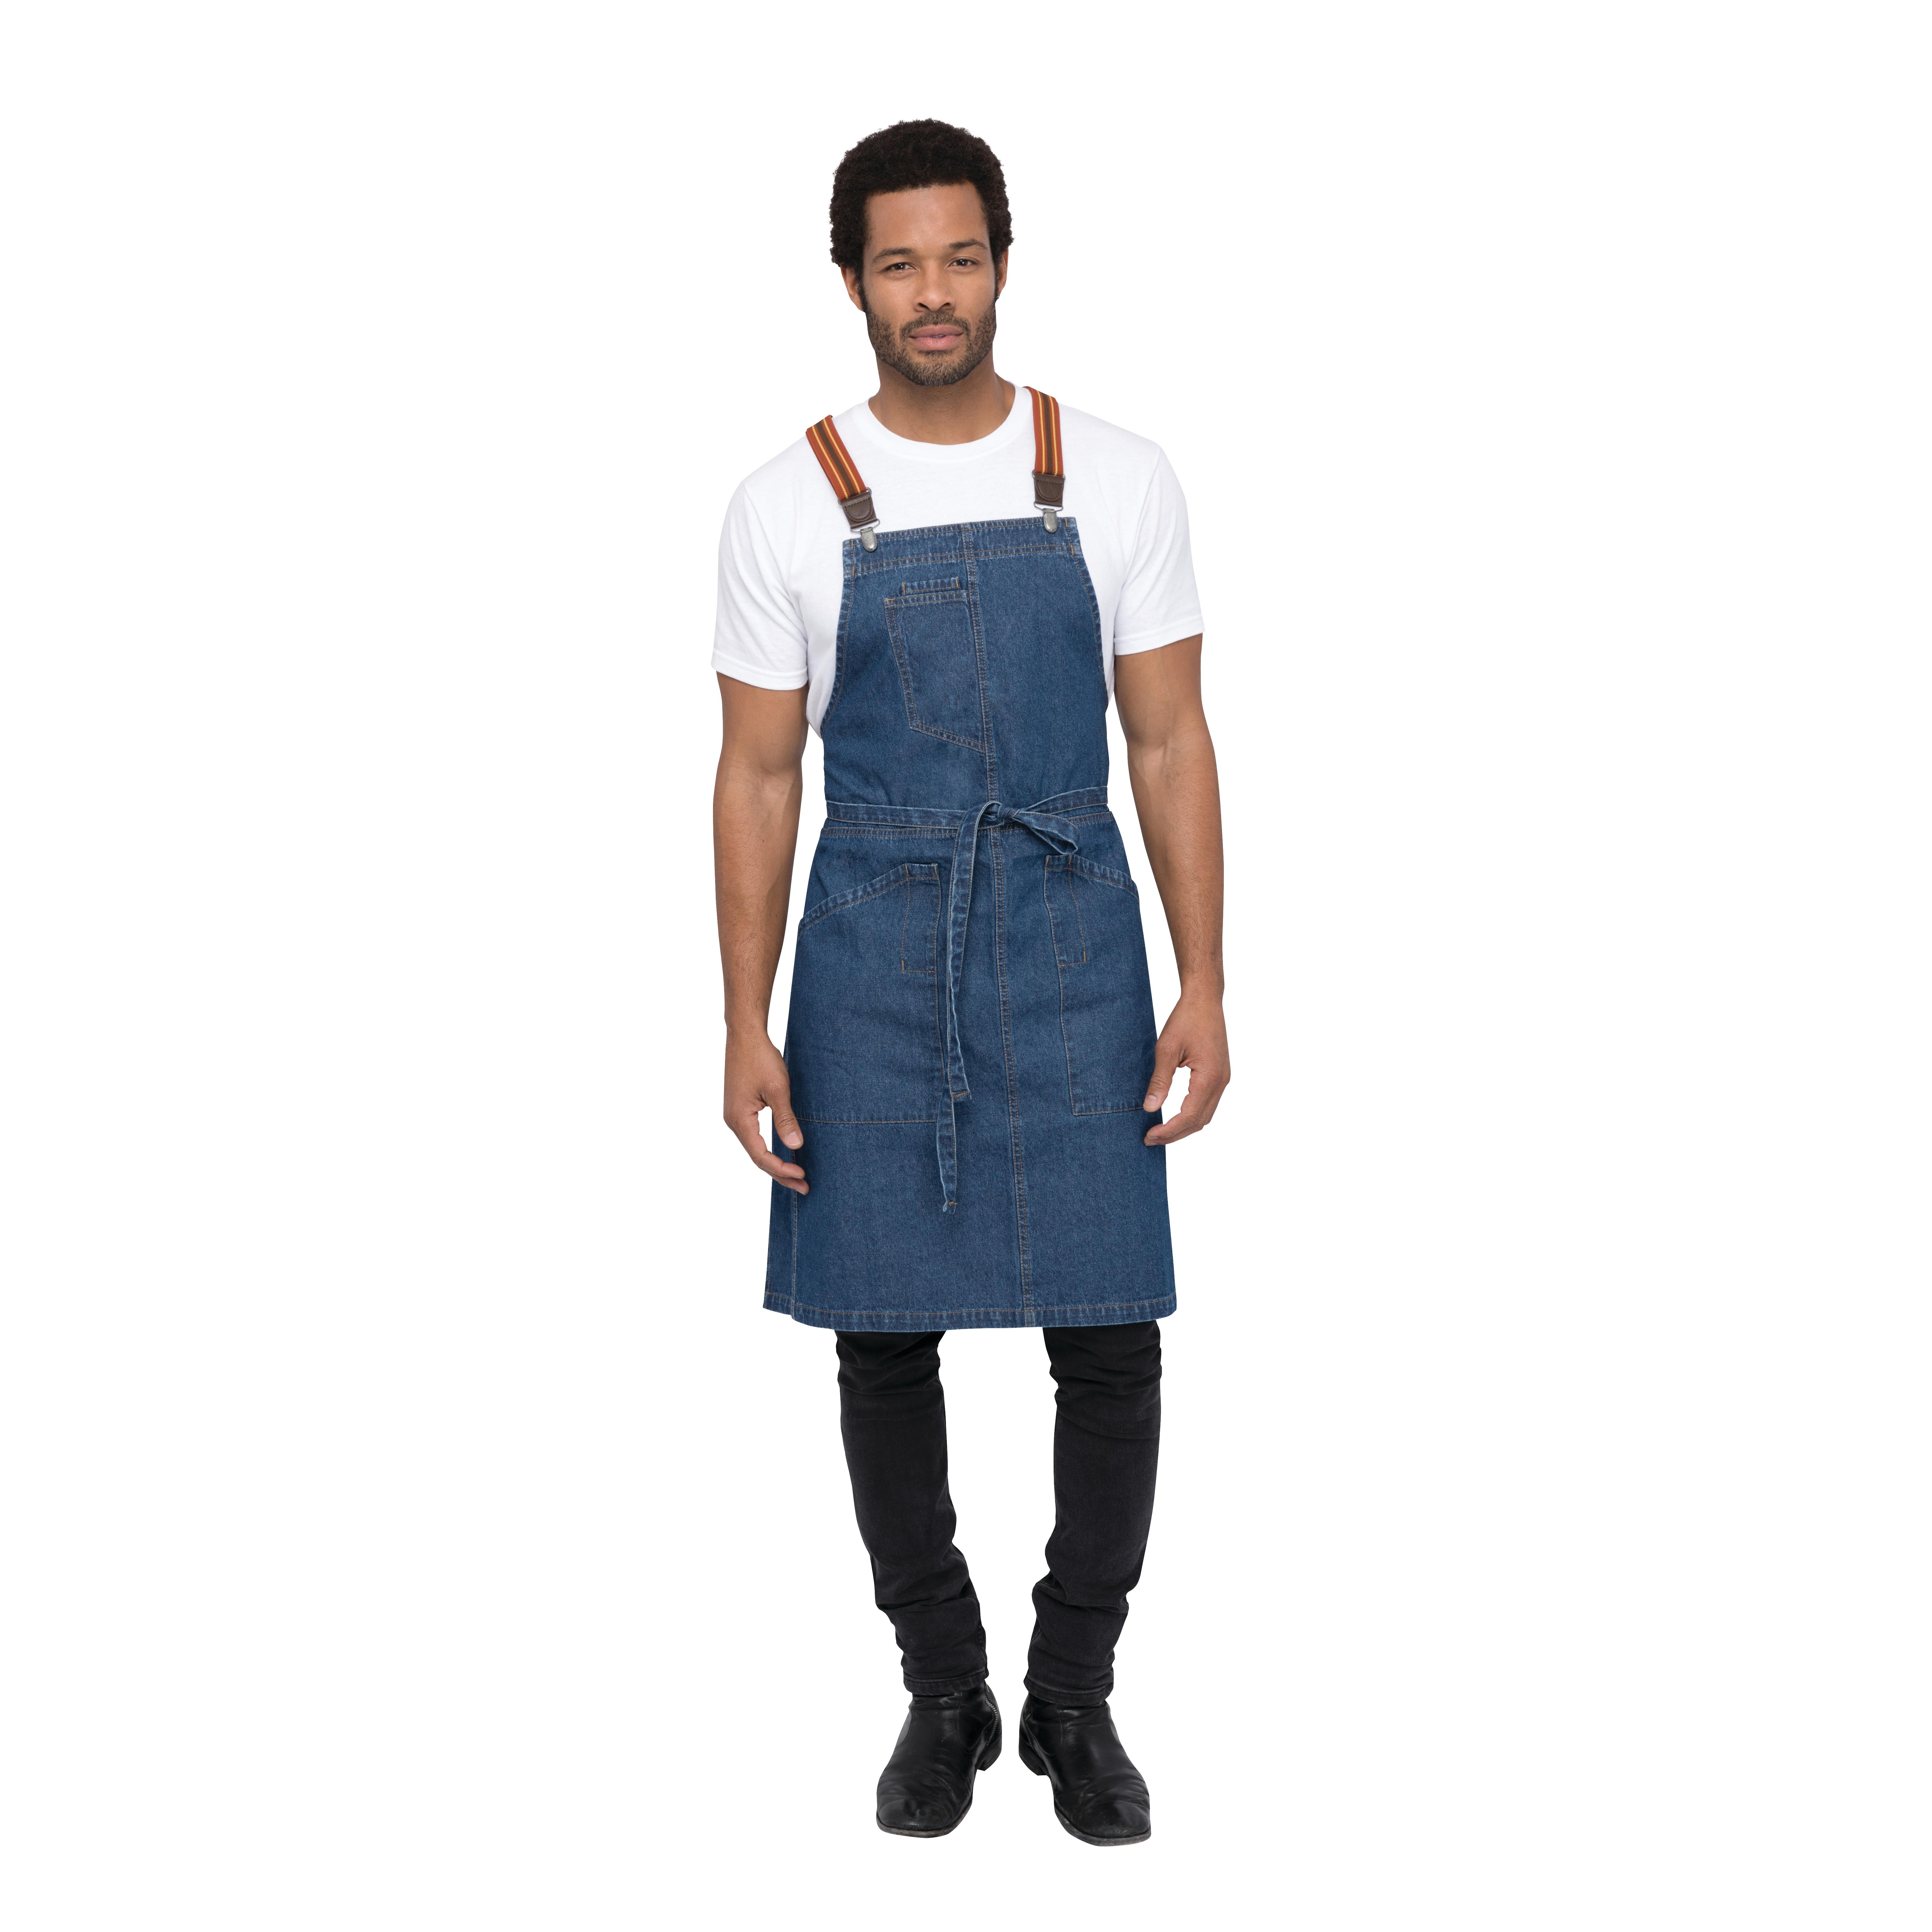 Chef Works ABS01MDB0 bib apron